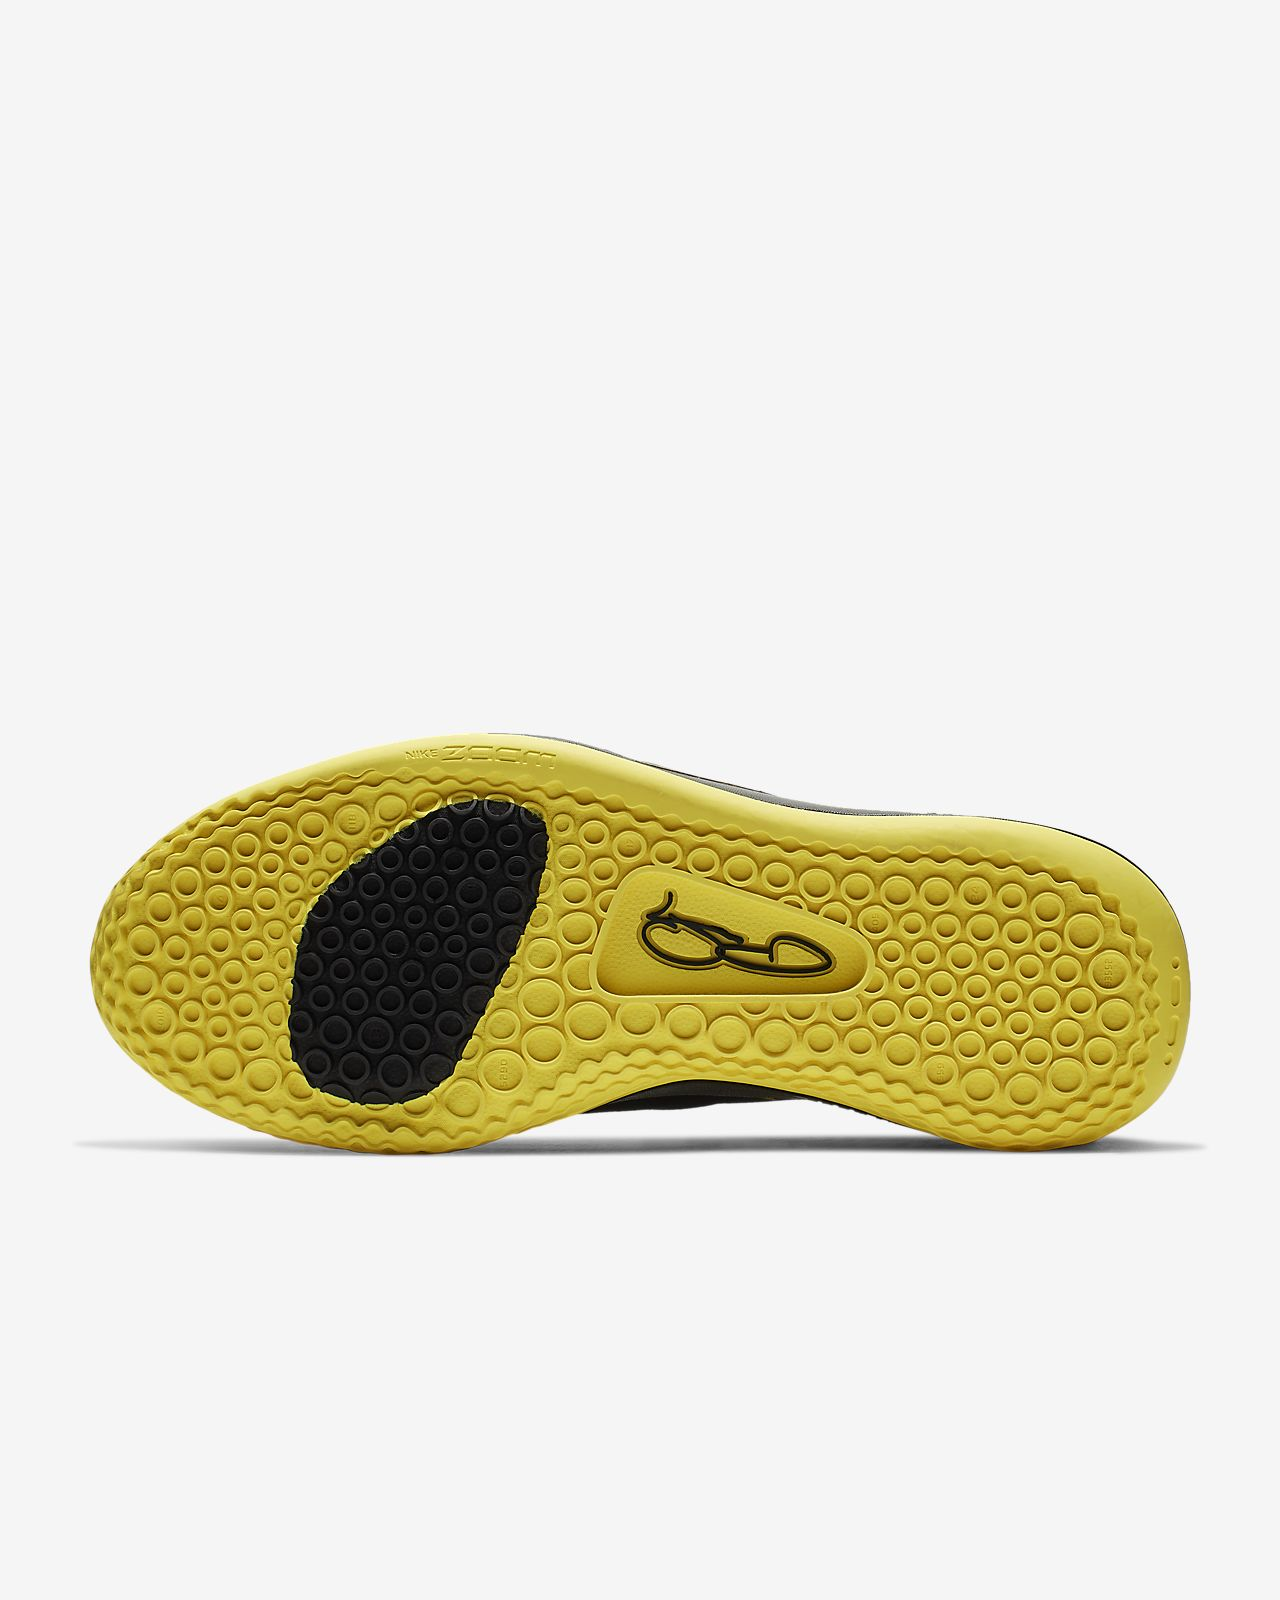 ffbc0d965fe Low Resolution PG 3 Basketball Shoe PG 3 Basketball Shoe